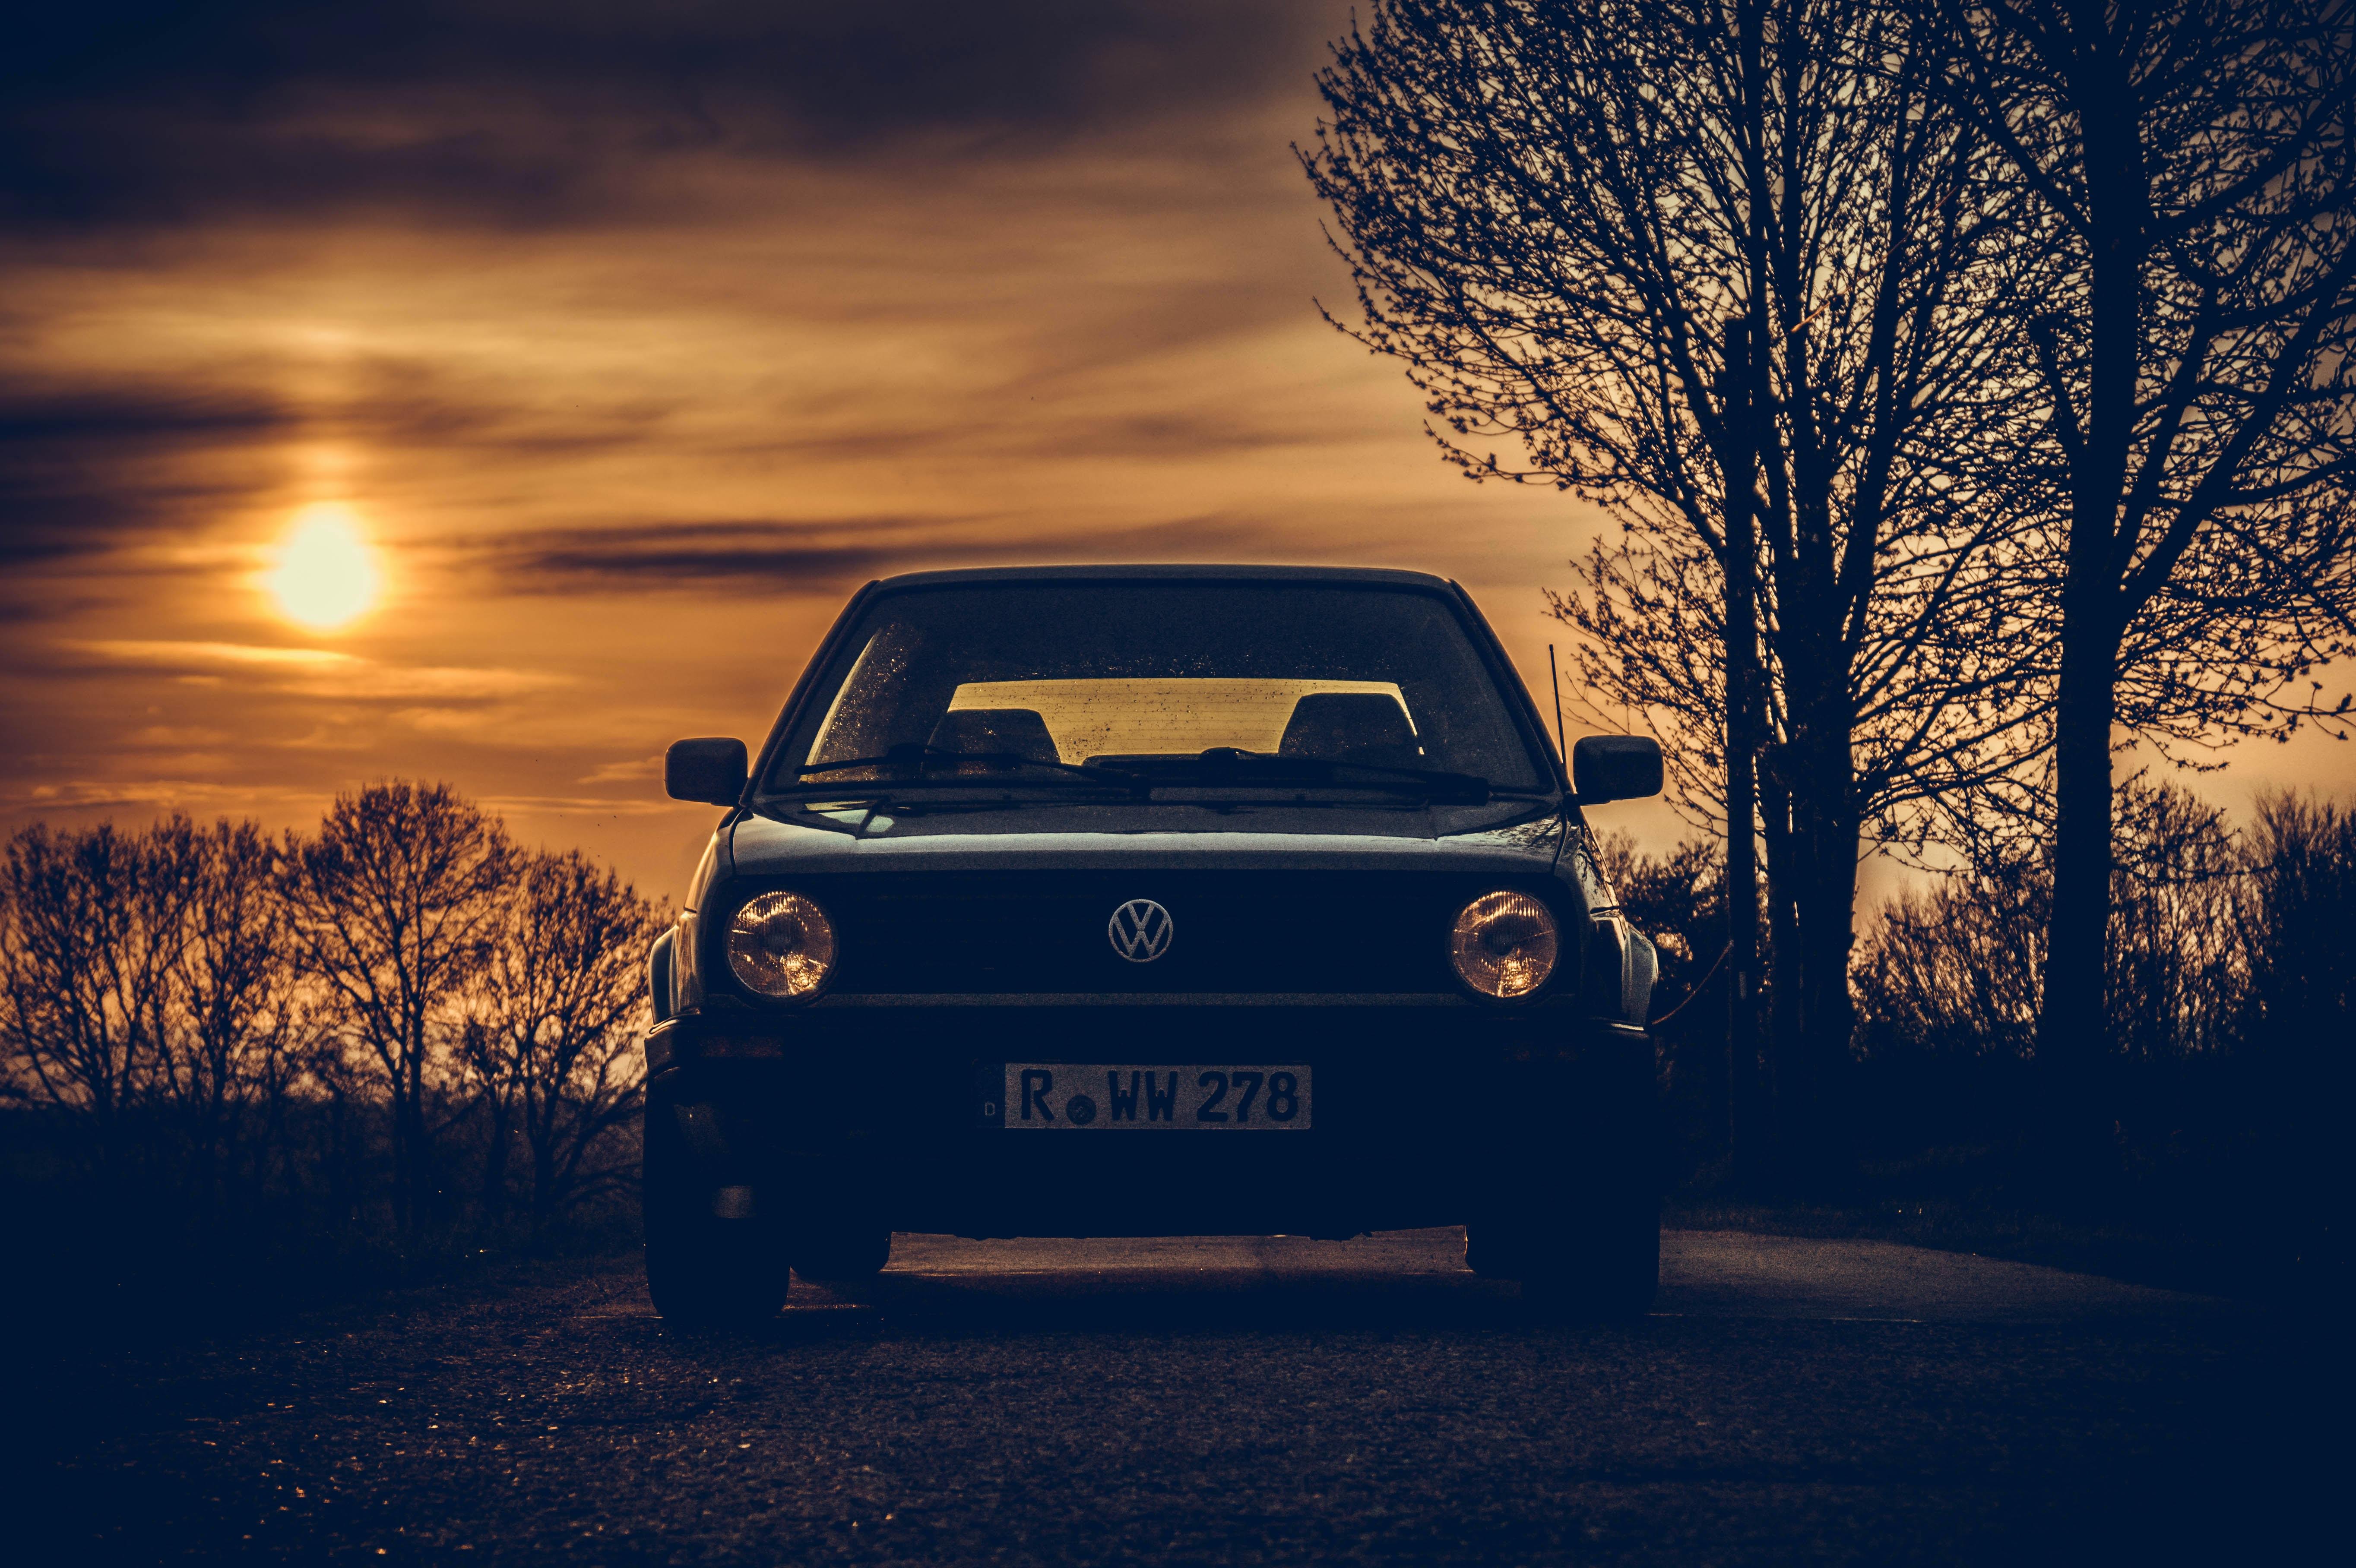 black Volkswagen vehicle in road beside bare trees at golden hor